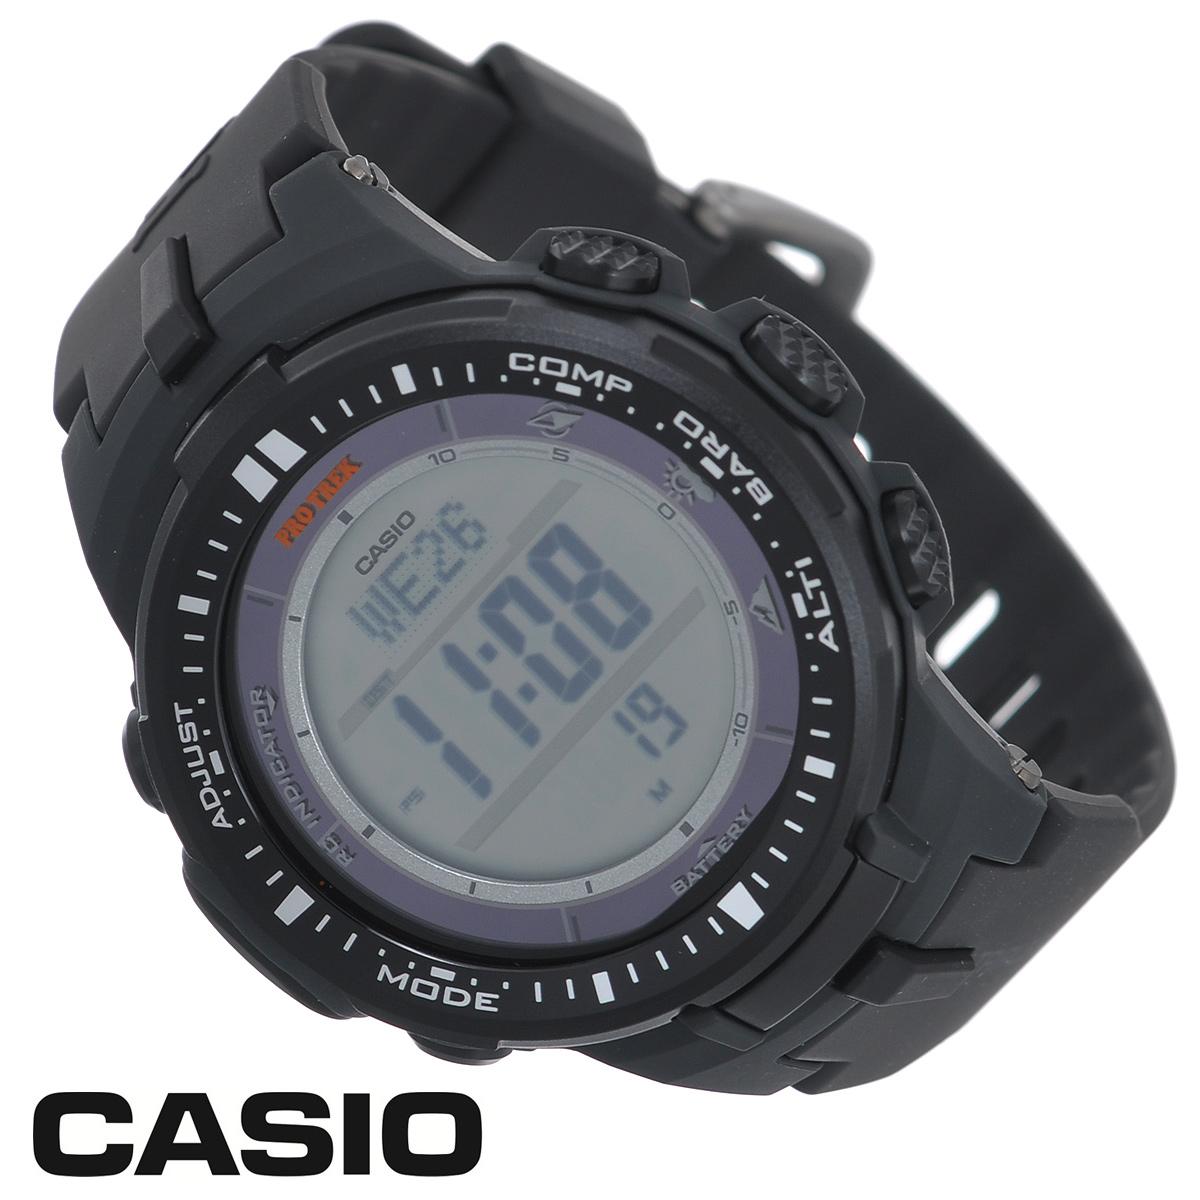 Часы мужские наручные Casio Protrek, цвет: черный, серый. PRW-3000-1E